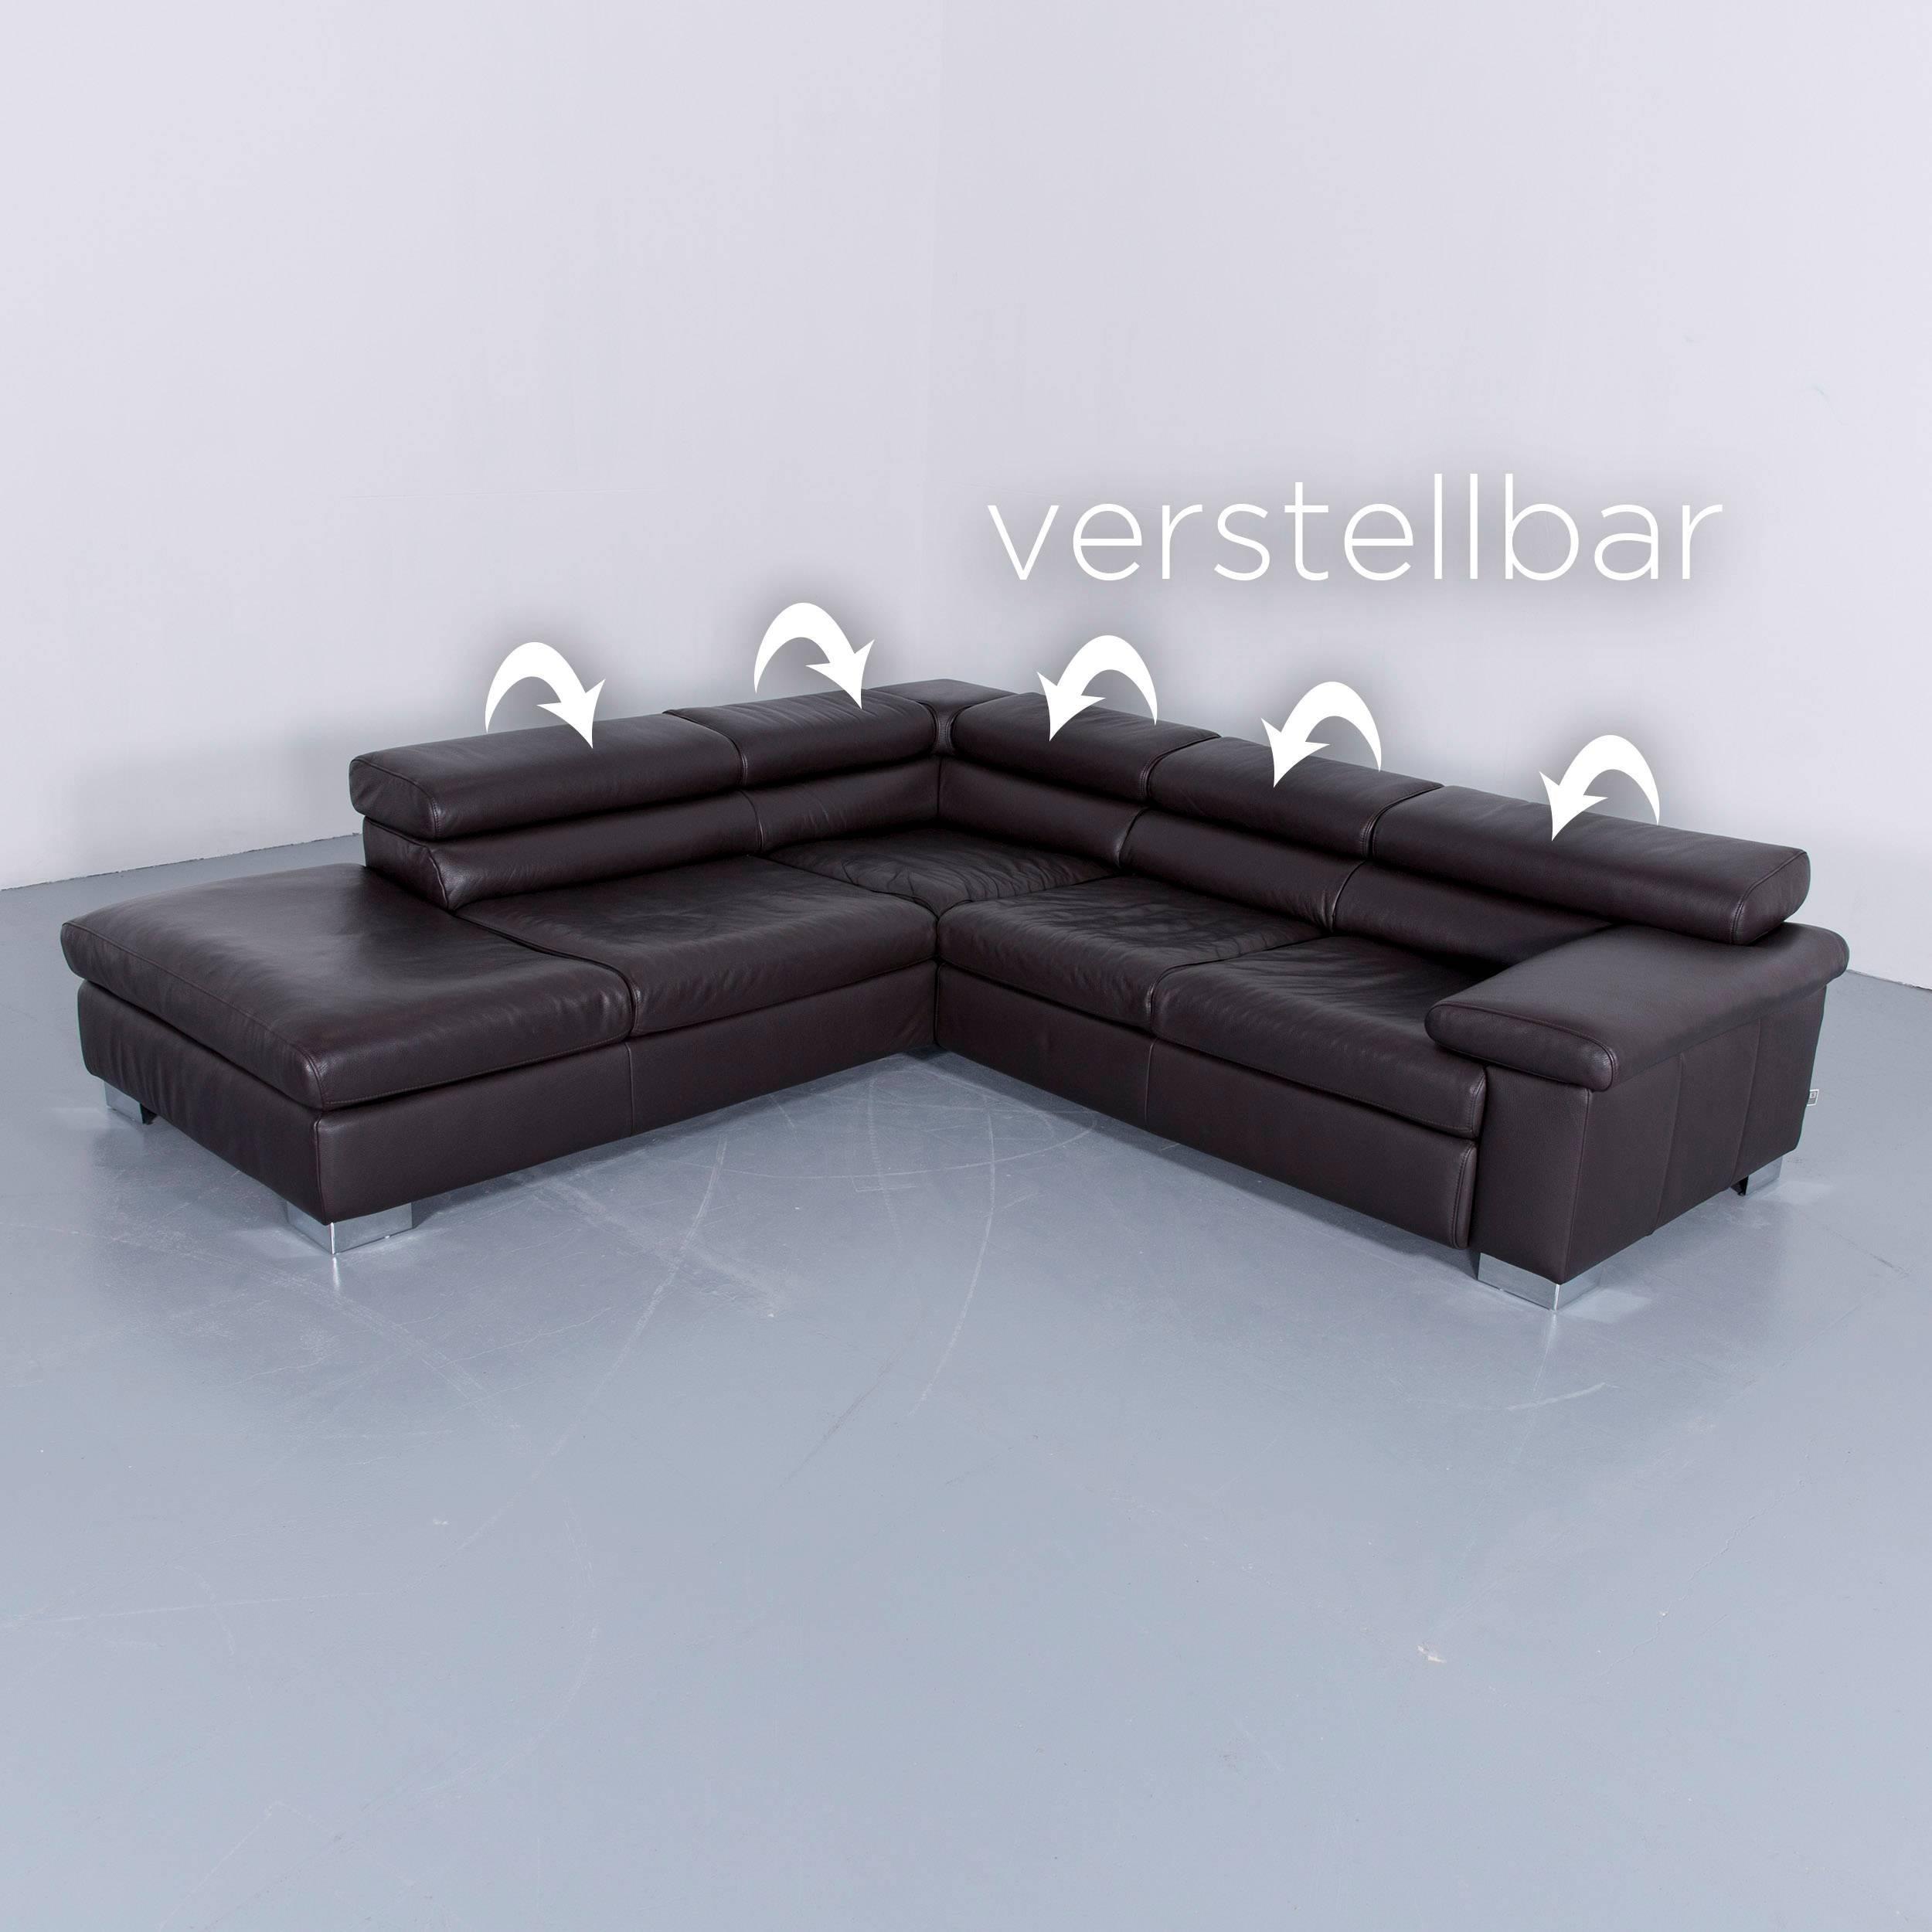 Liebenswert Leder Ecksofa Braun Referenz Von Couch - Maak Het U Gemakkelijk Om